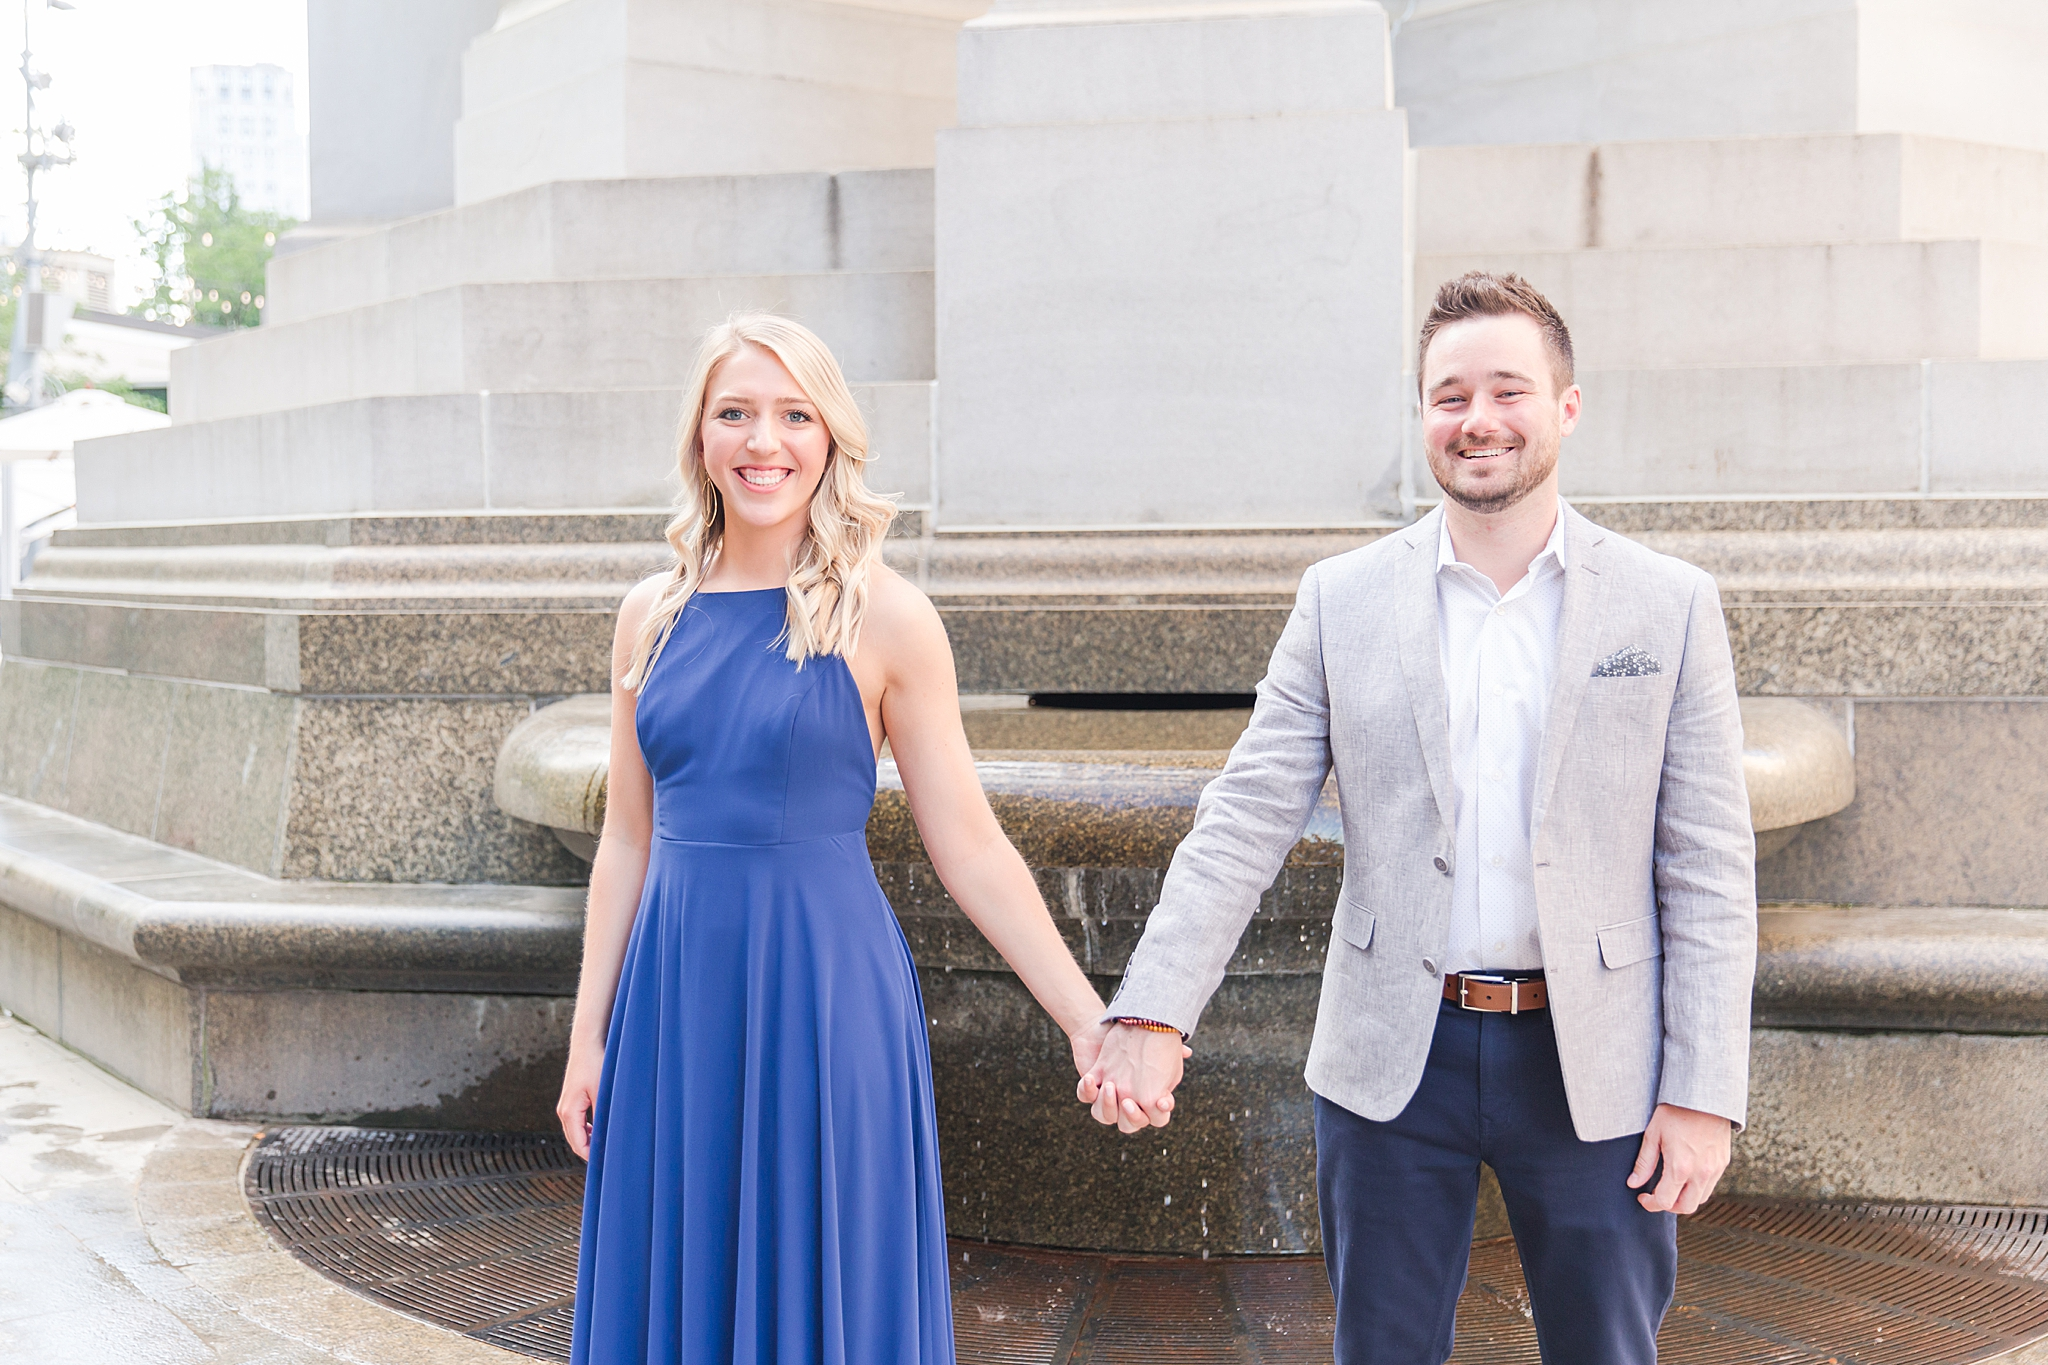 detroit-wedding-photographer-downtown-detroit-belle-isle-engagement-photos-sarah-eric-by-courtney-carolyn-photography_0030.jpg